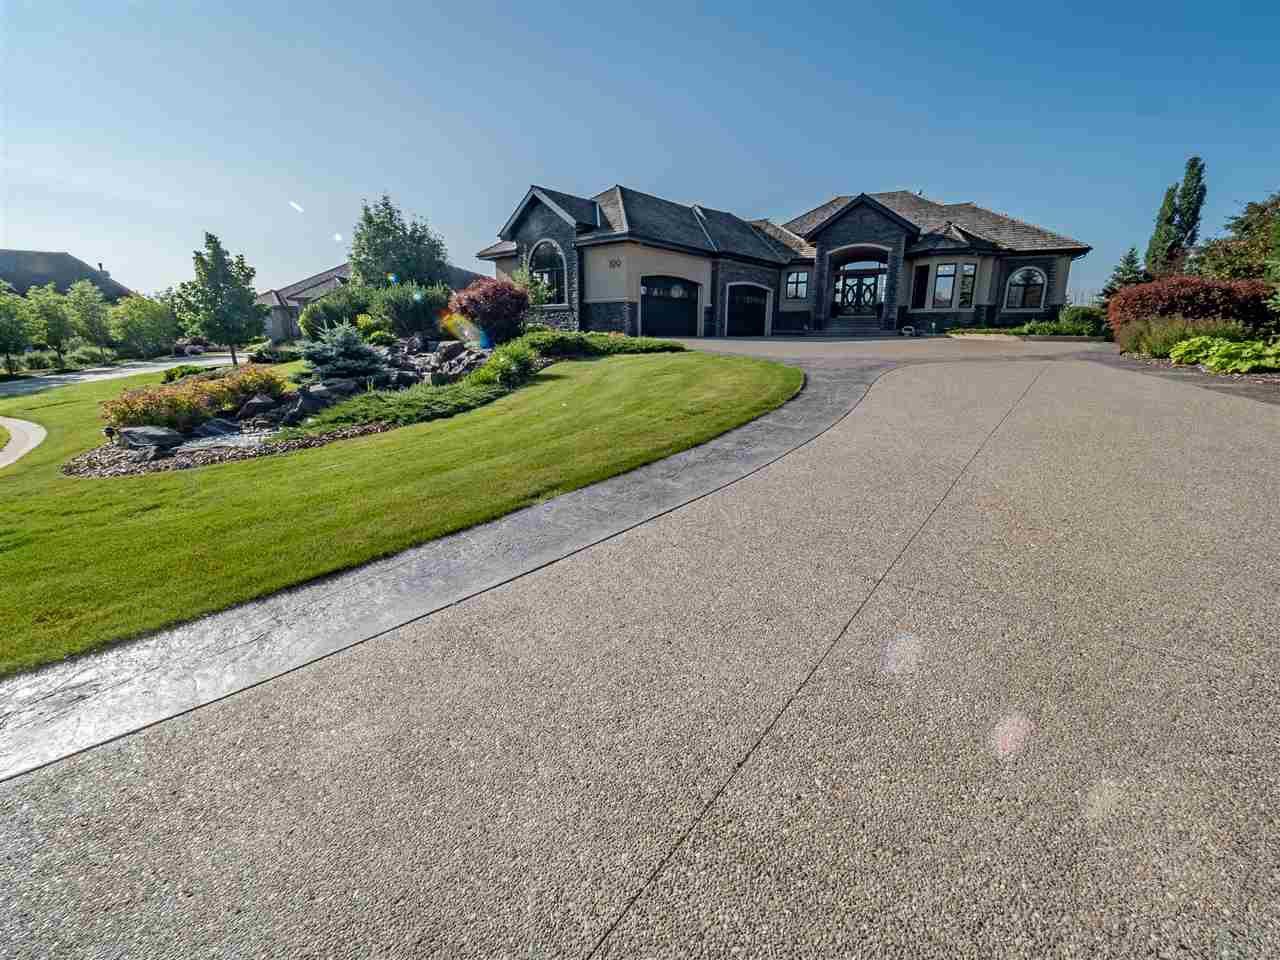 Main Photo: 199 Riverside Close: Rural Sturgeon County House for sale : MLS®# E4183431